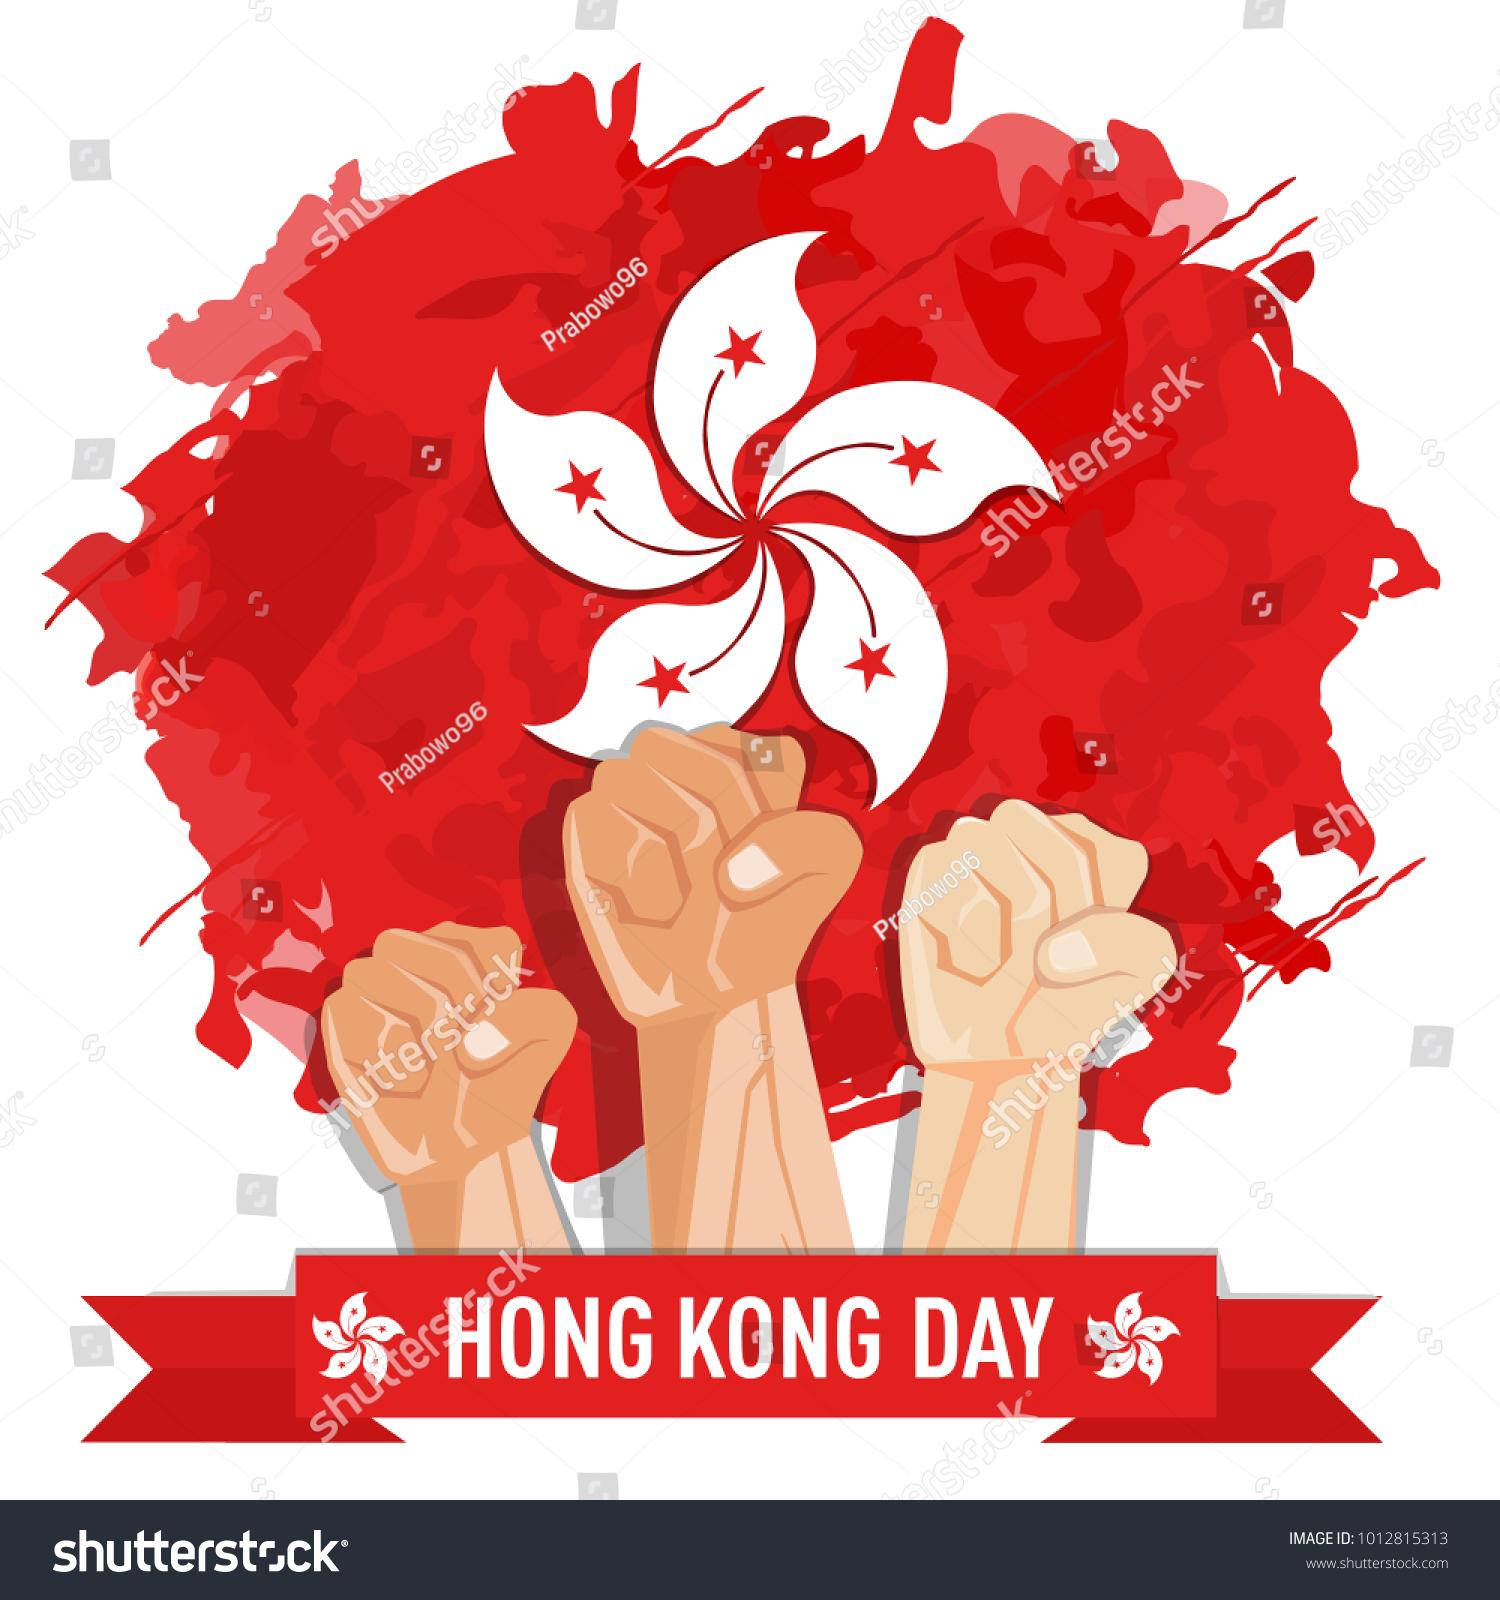 Hand Fist Arm Symbol National Awakening Stock Vector 1012815313